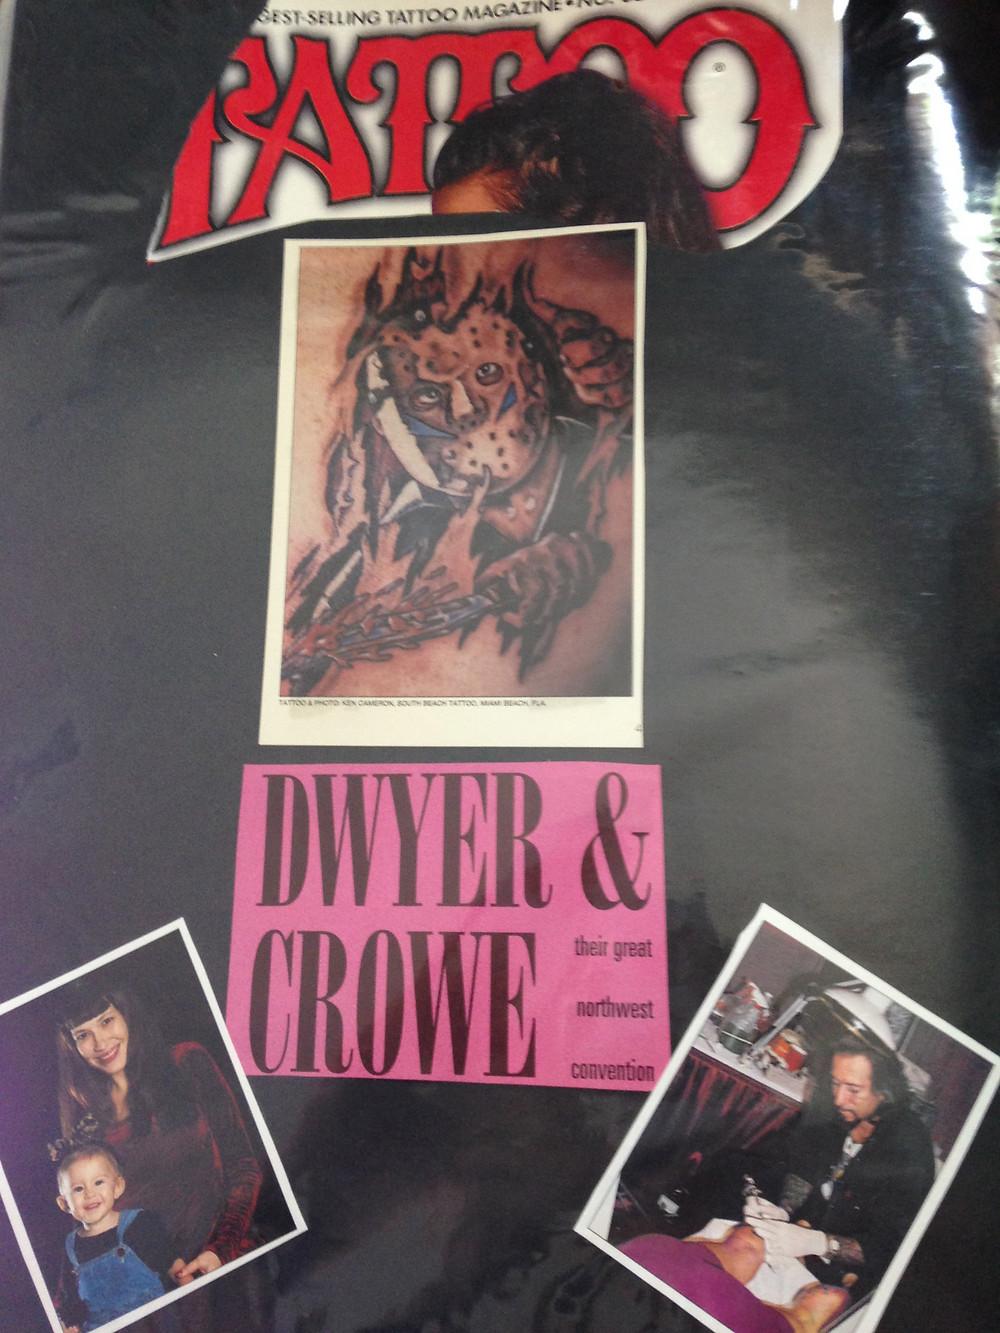 Tattoo Magazine September 1996